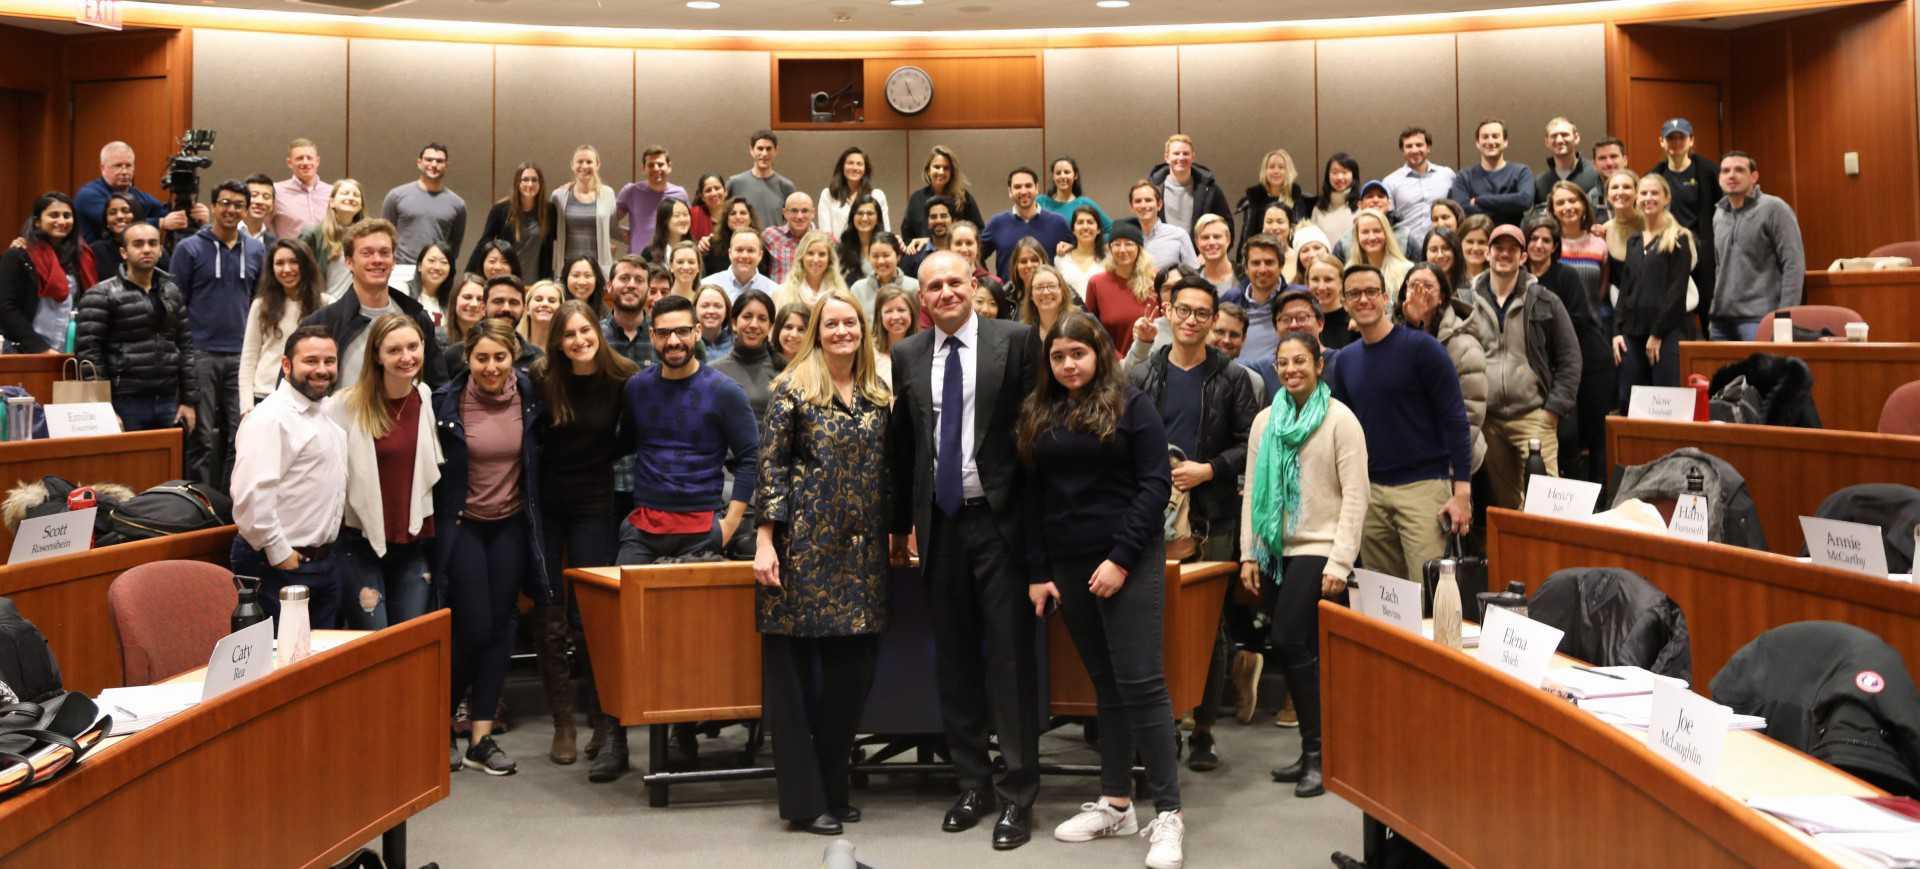 5W CEO Speaks at Harvard Business School on Crisis 5W PR